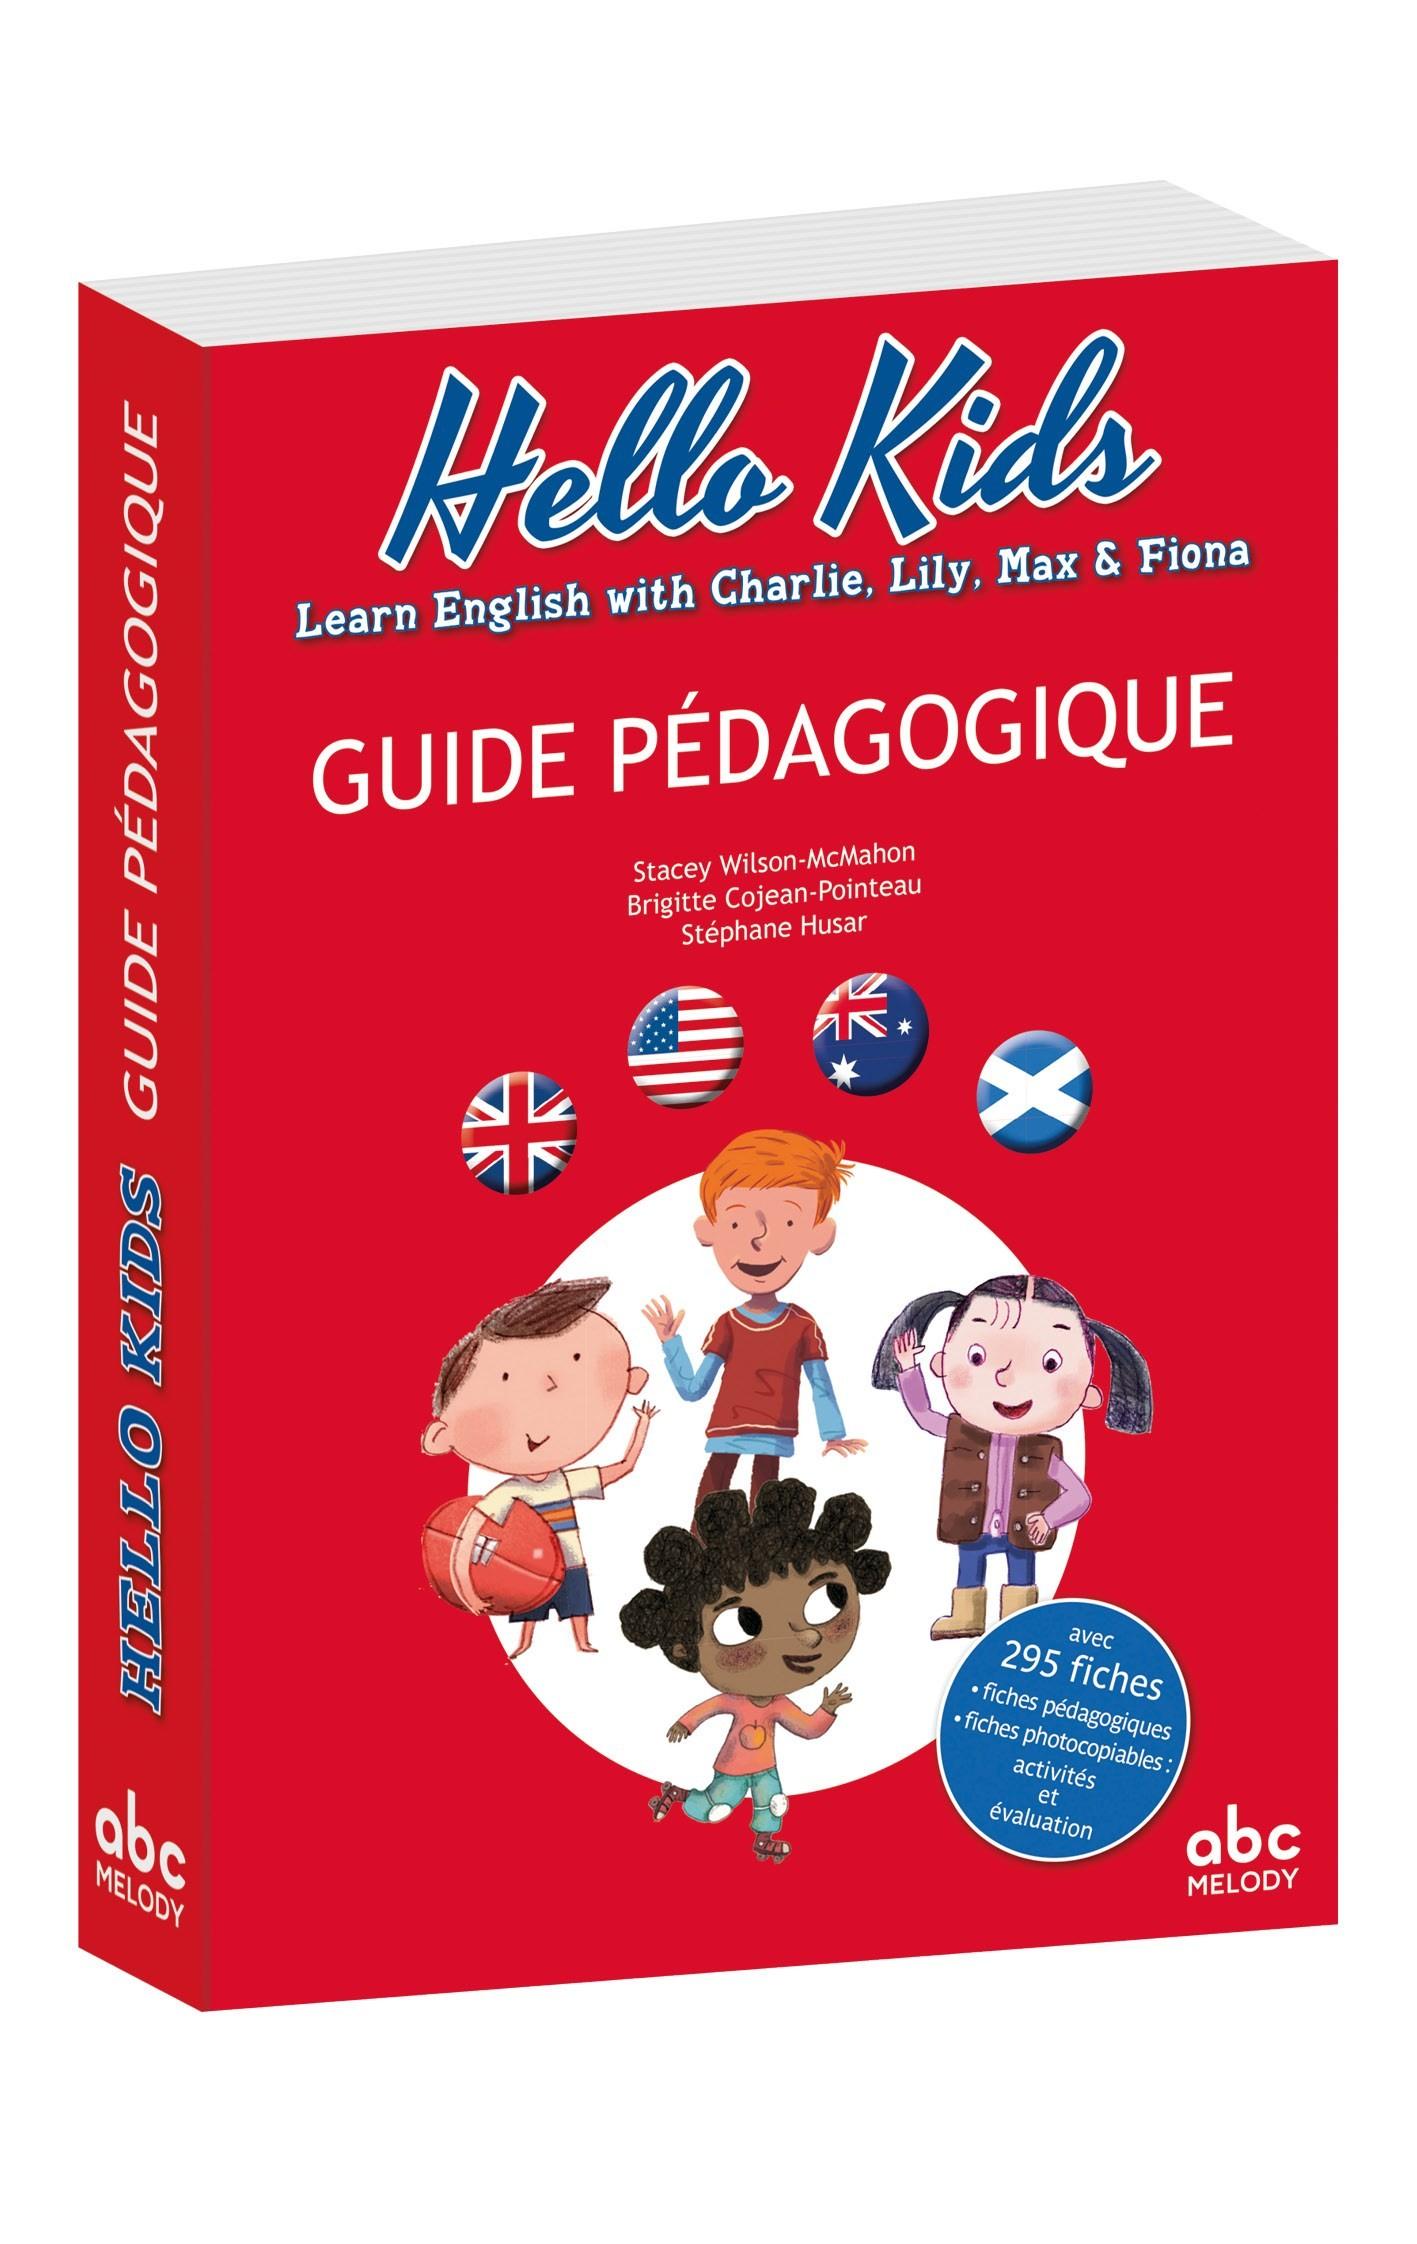 HELLO KIDS GUIDE PEDAGOGIQUE / LIVRES CD / ABC MELODY